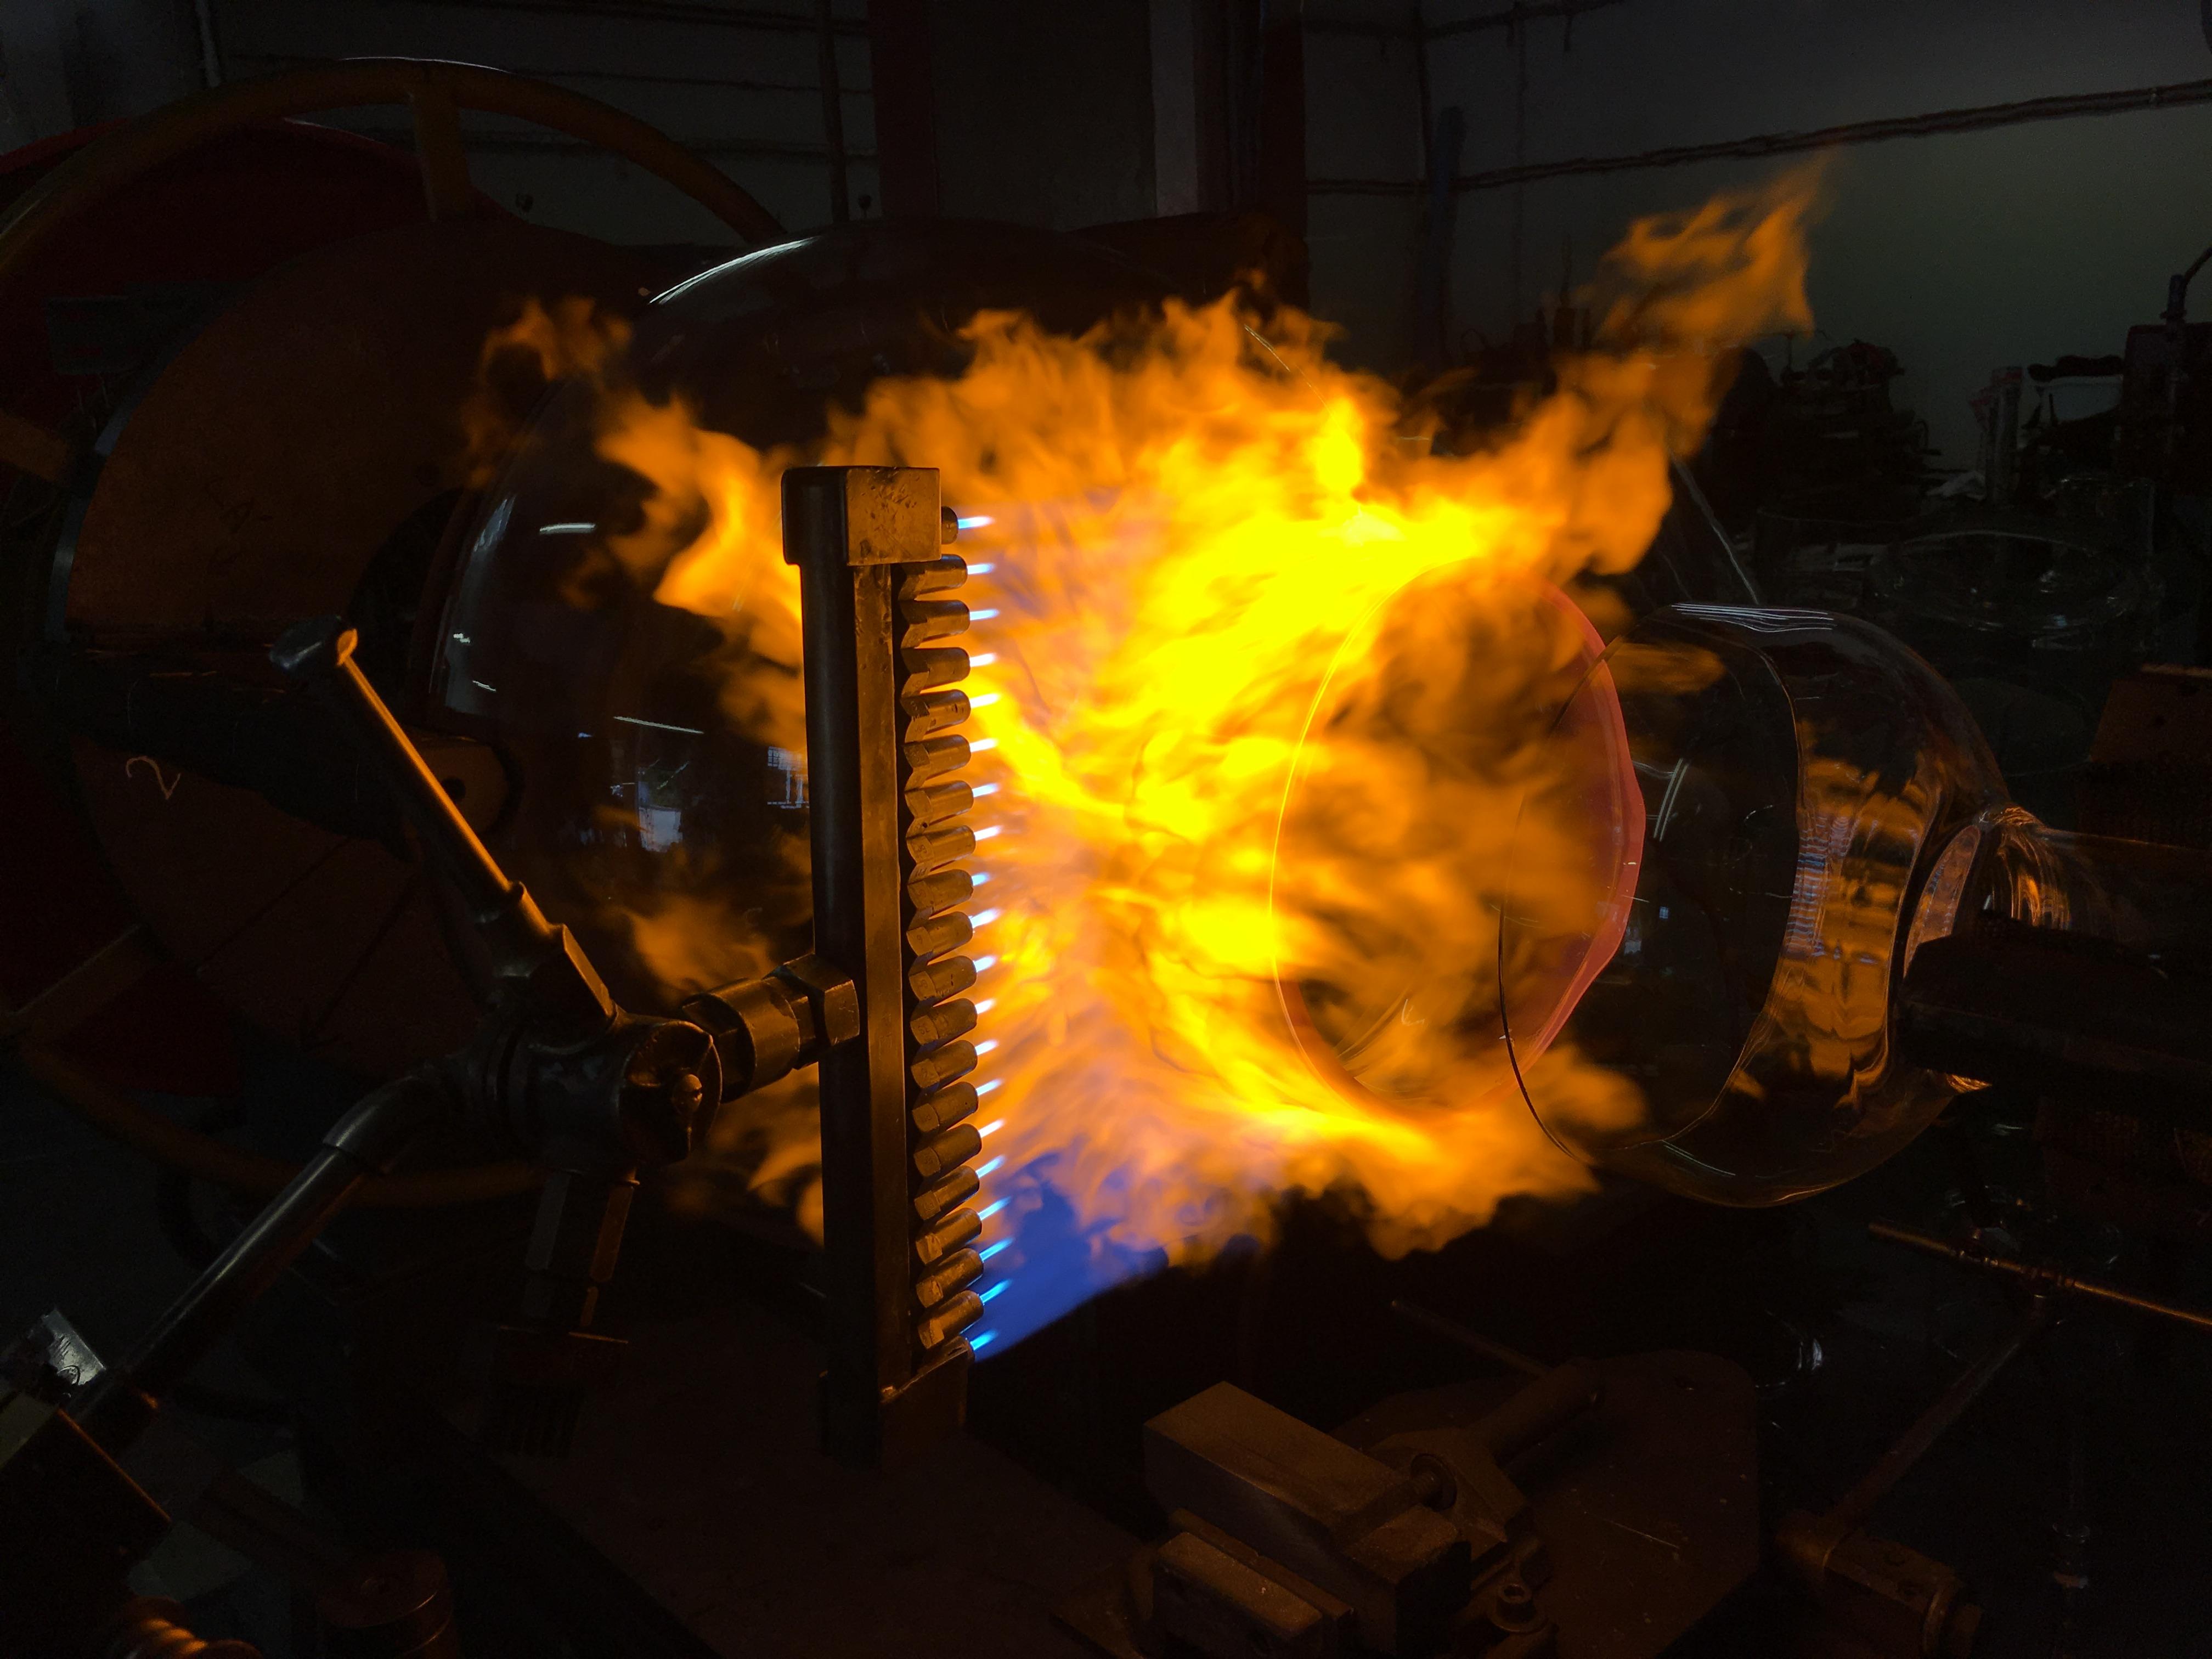 flamme-borosilicate-soufflage-de-verre-equipements